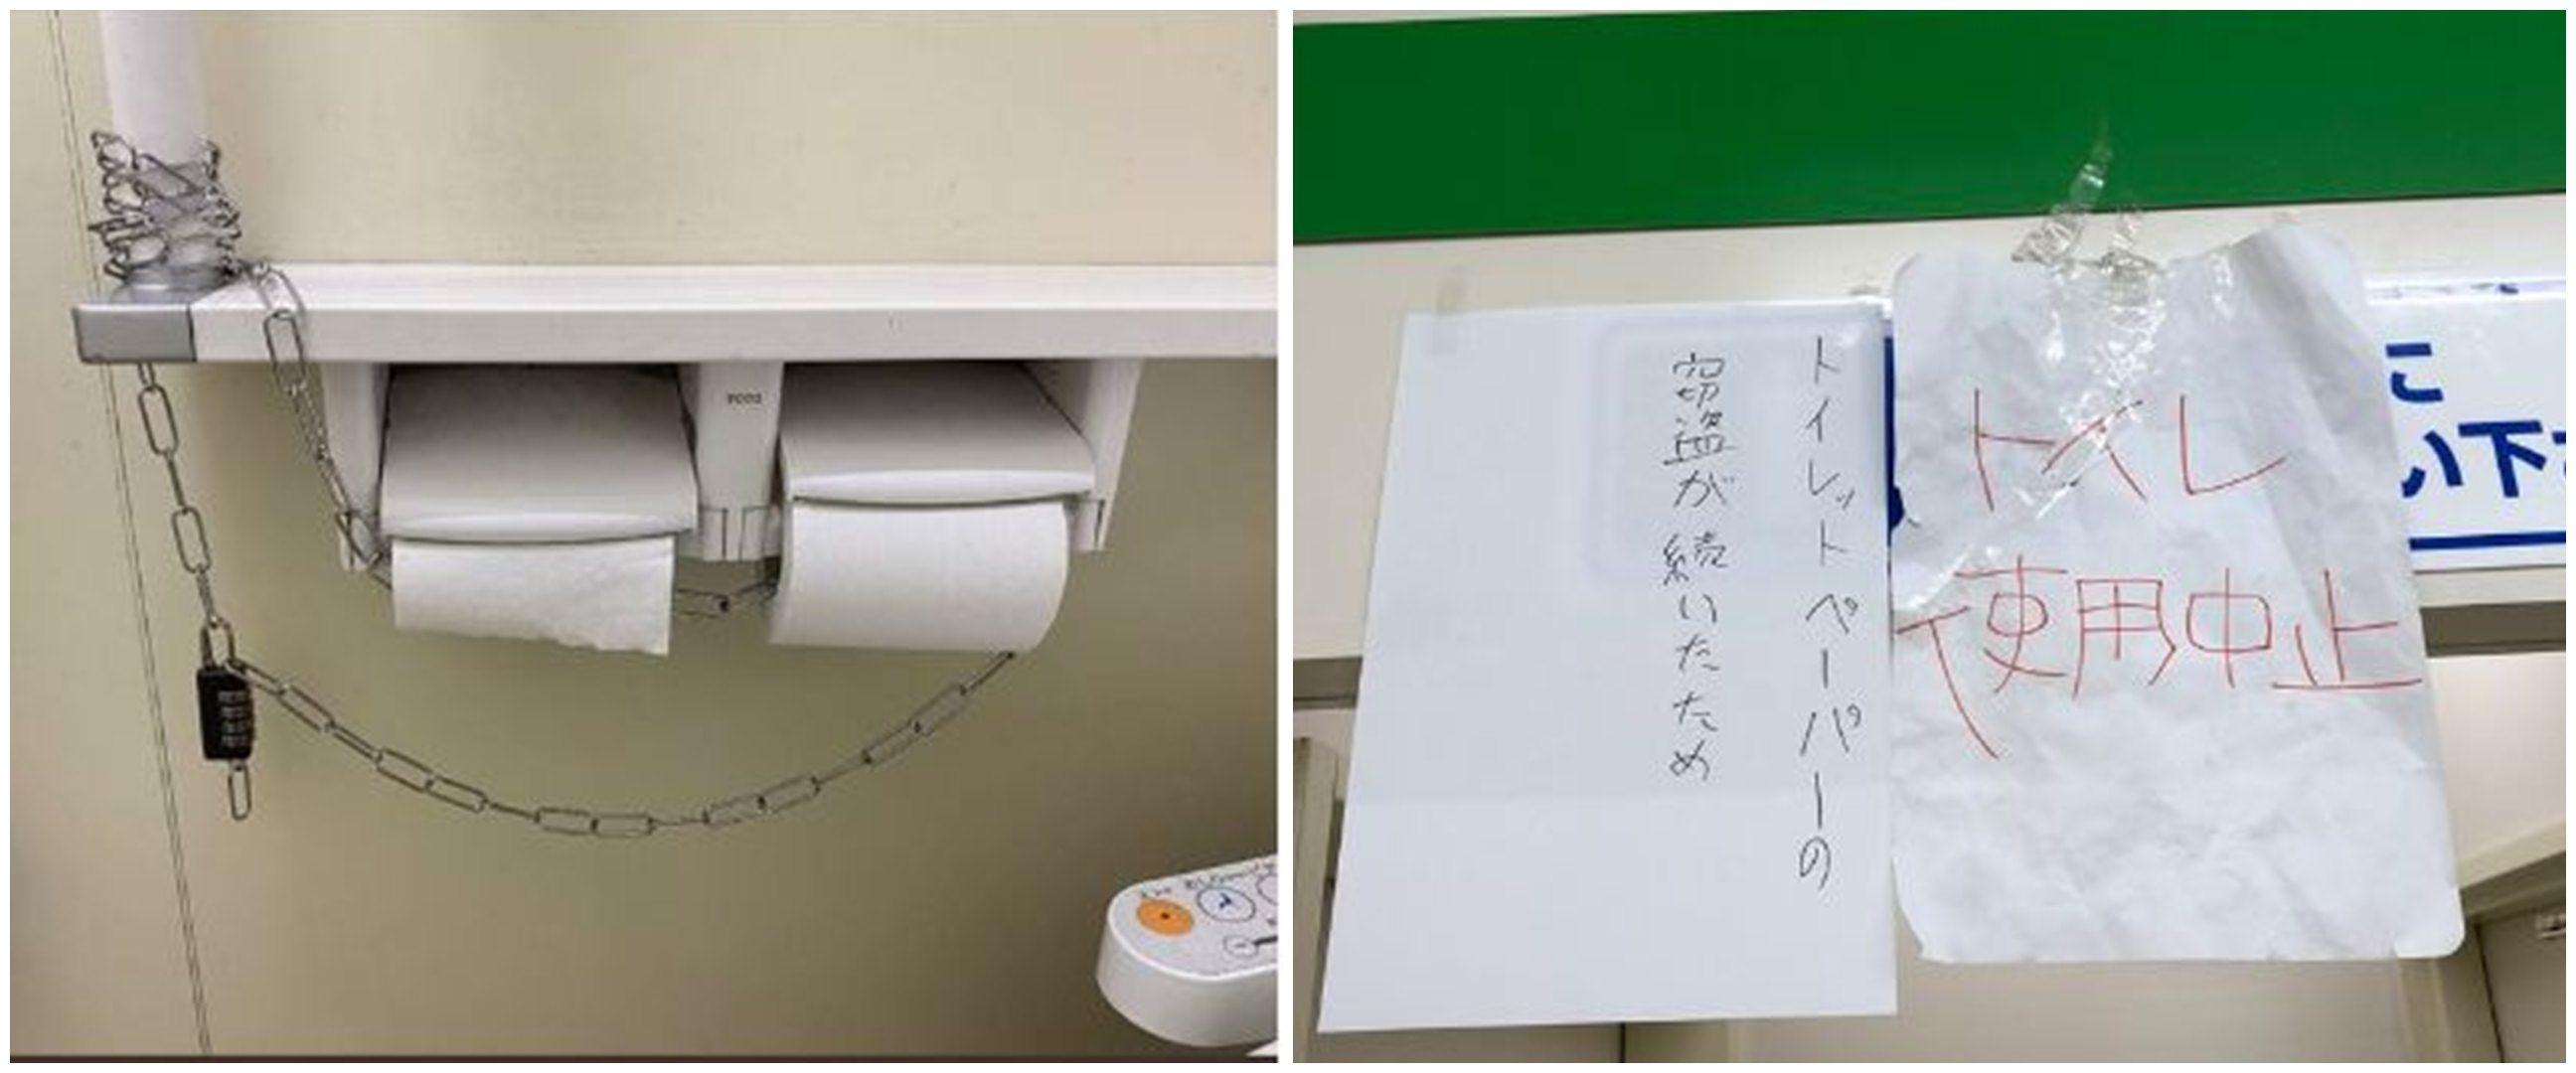 Virus Corona merebak, viral foto tisu toilet umum digembok pengelola